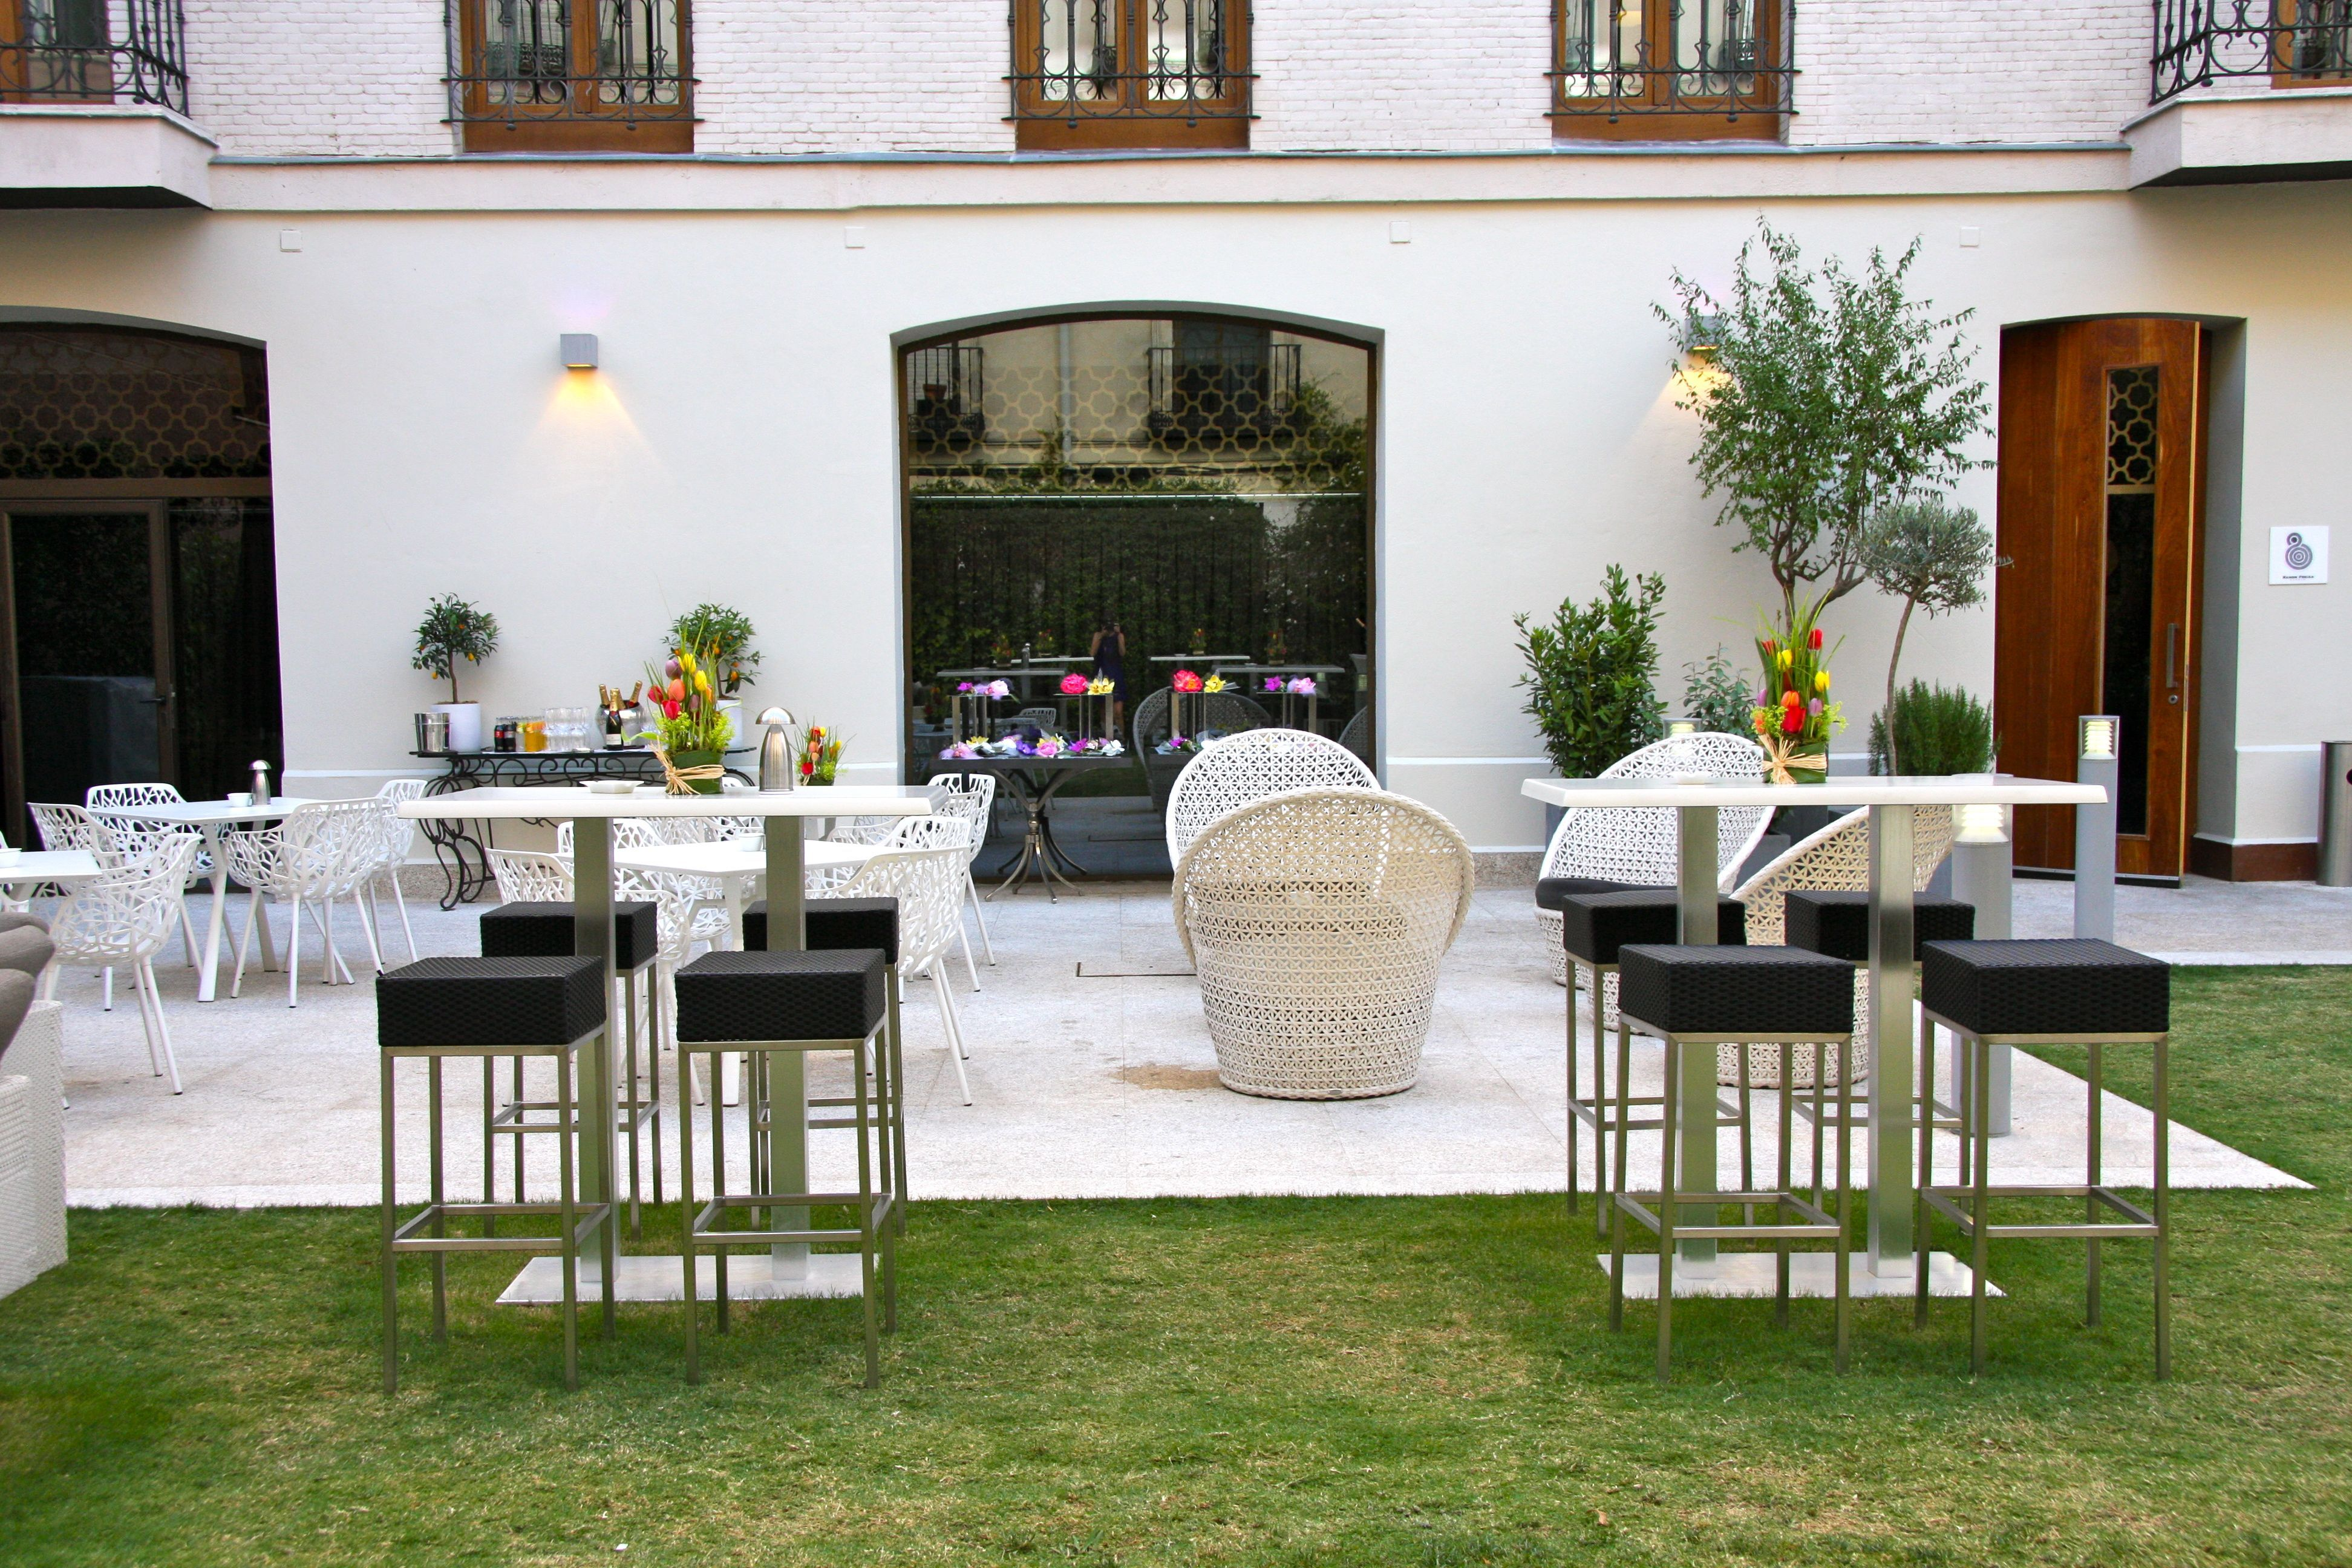 #localizacionesparaeventos #cateringeventos #eventosMadrid #hotelunicomadrid #hotelesdelujomadrid www.lareinaoca.com